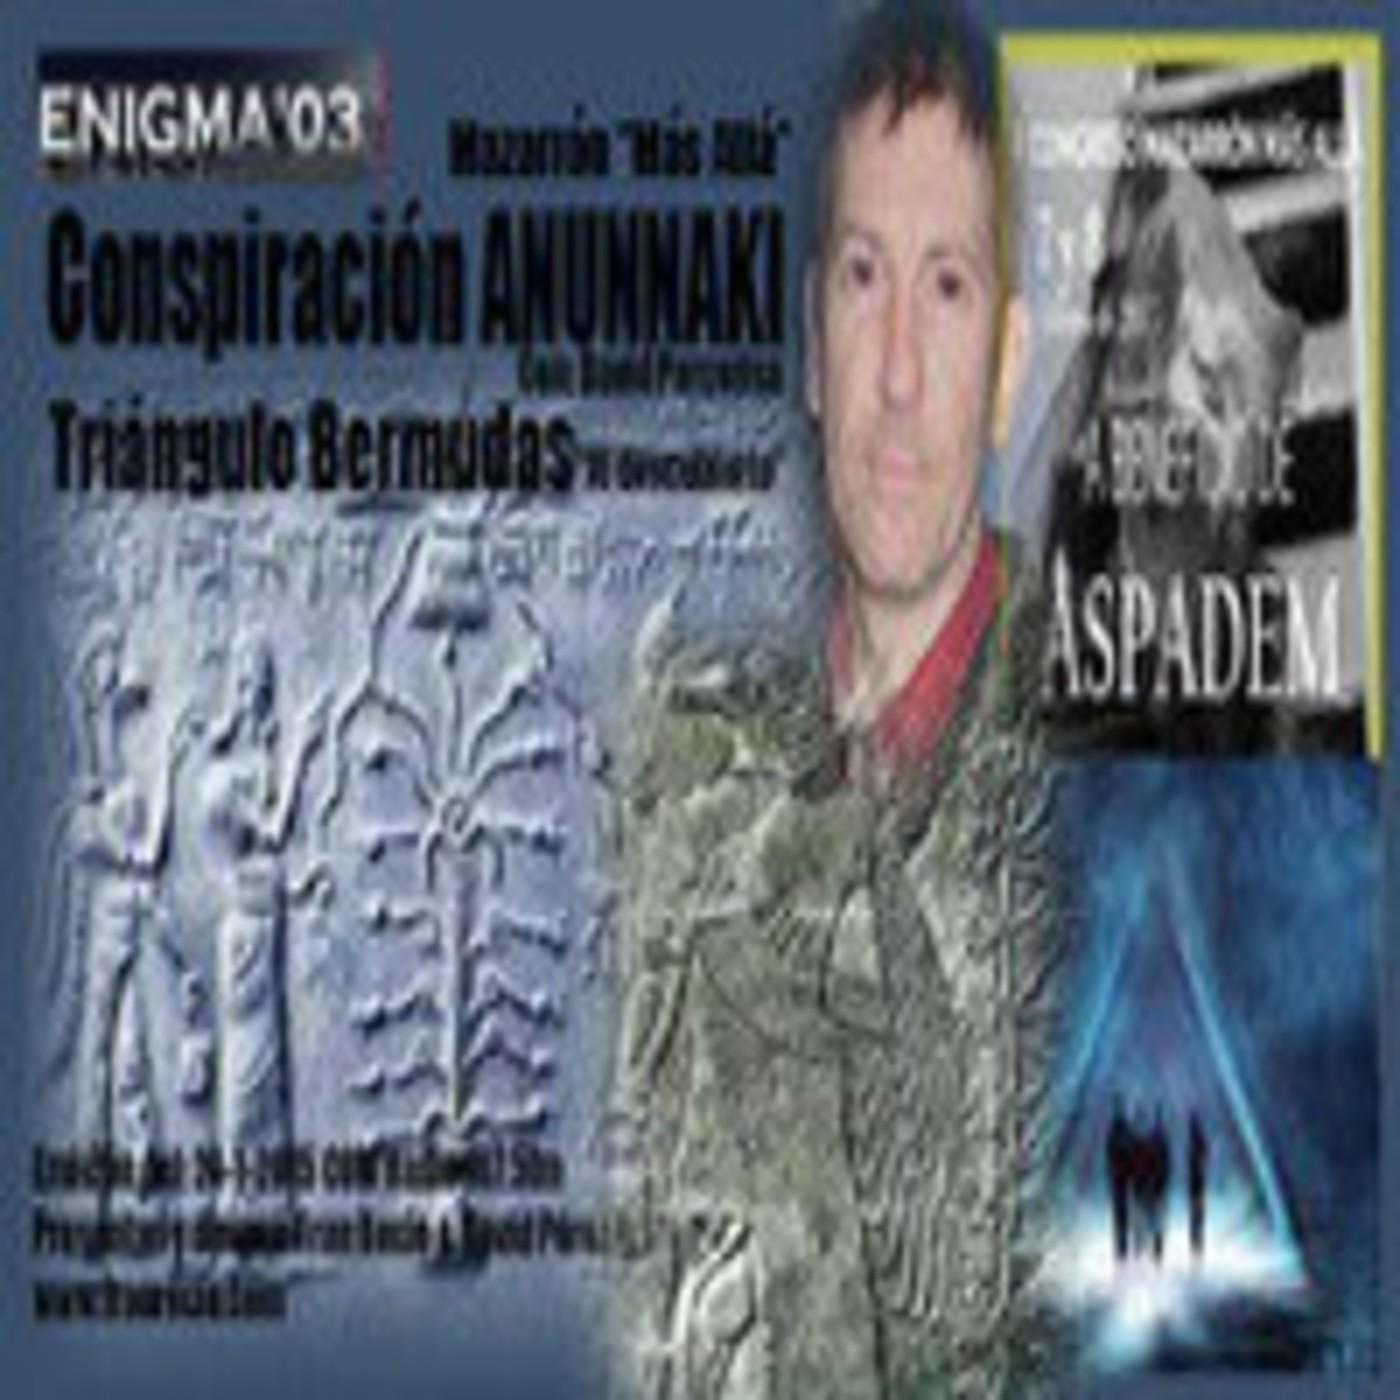 Enigma 03 Triángulo Bermudas - ANUNNAKIS - Mazarrón 2015 (24-1-2015)